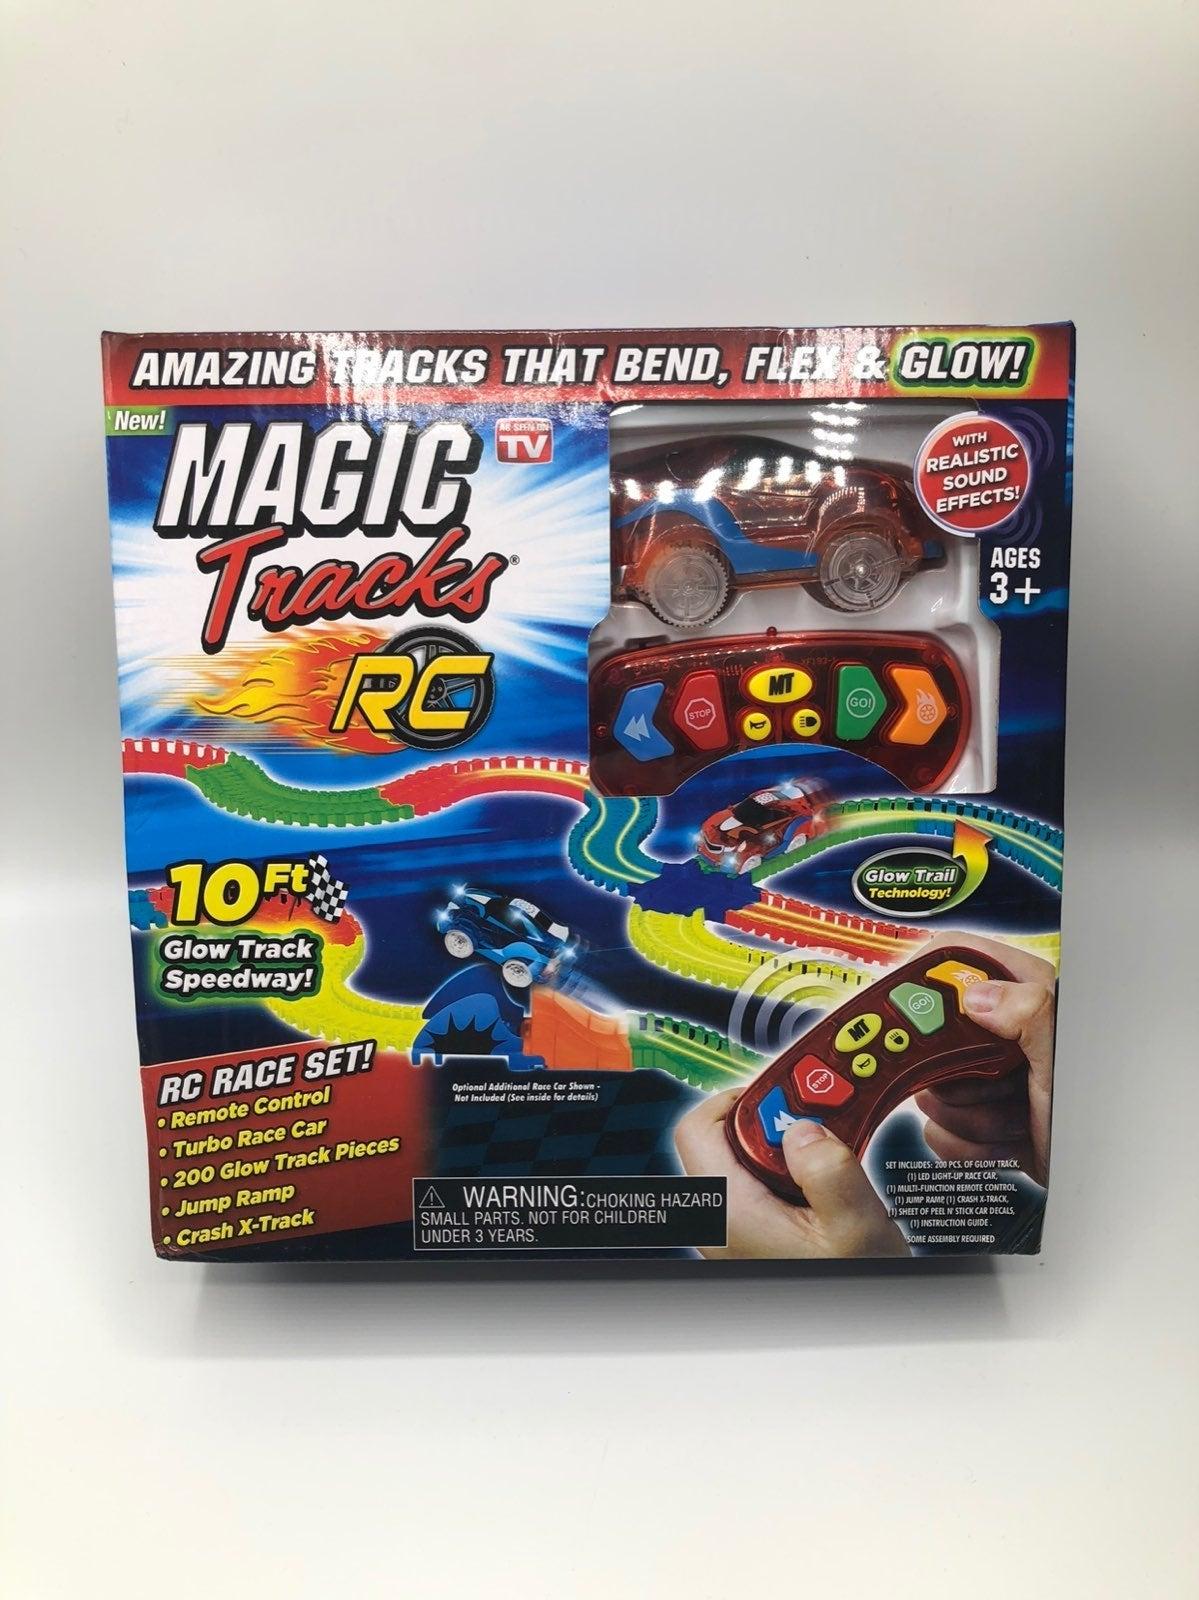 Magic Tracks RC cars